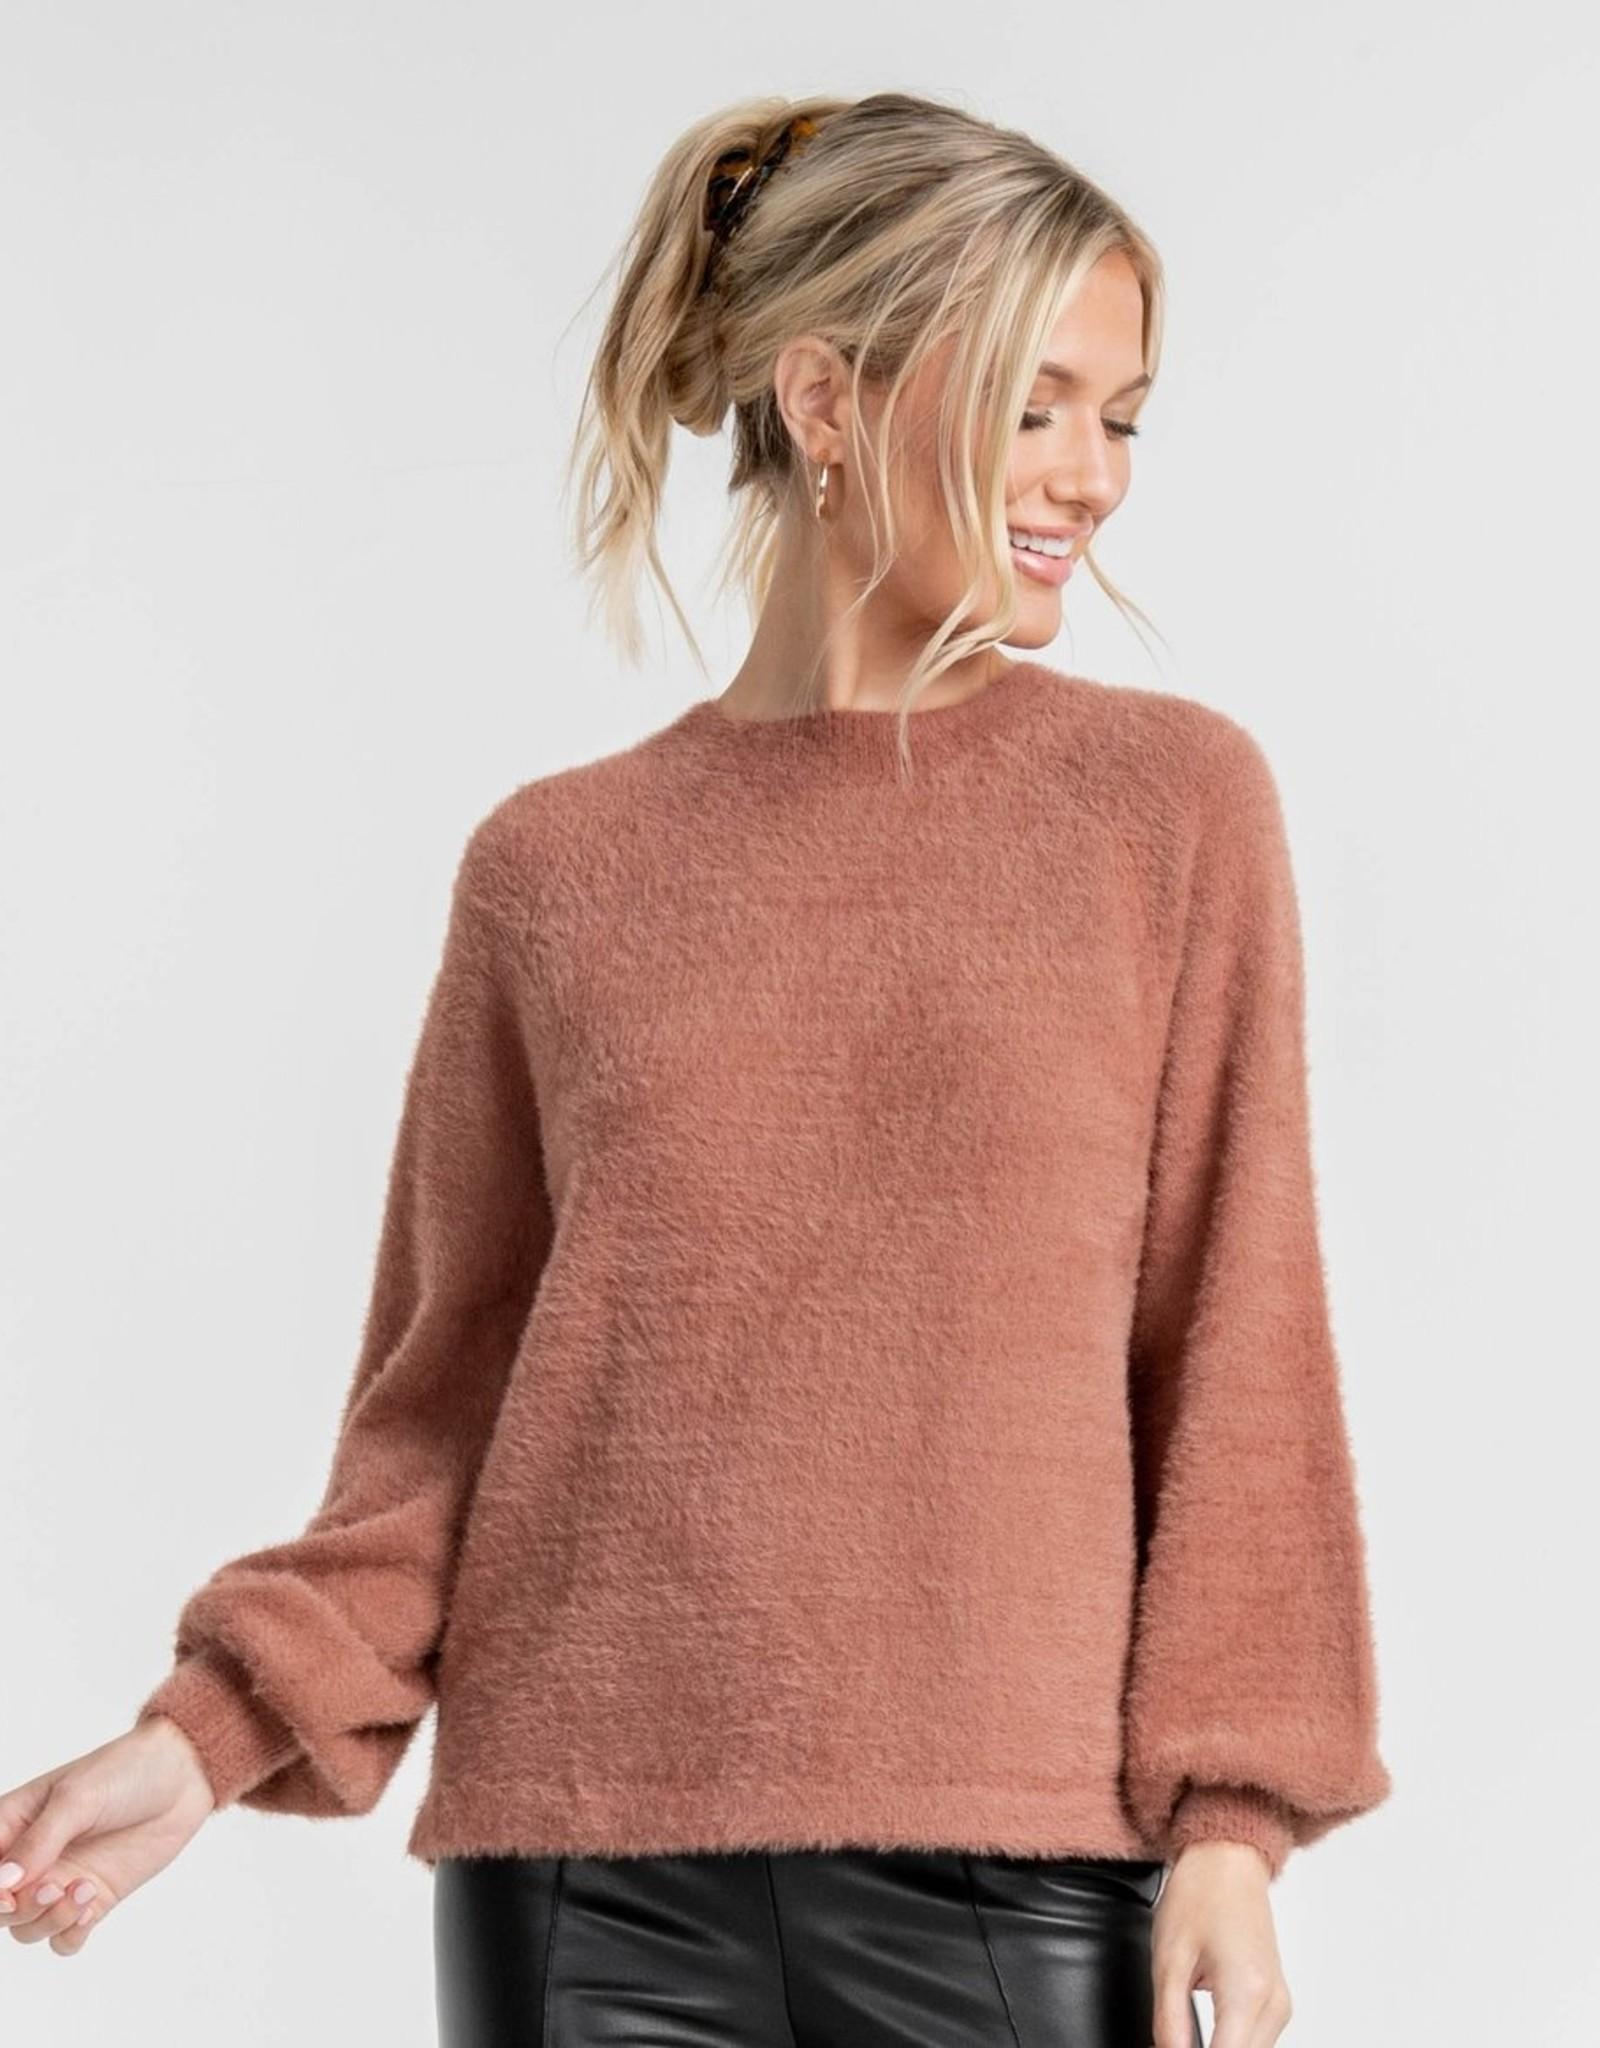 Southern Shirt Feather Knit Mockneck Sweater